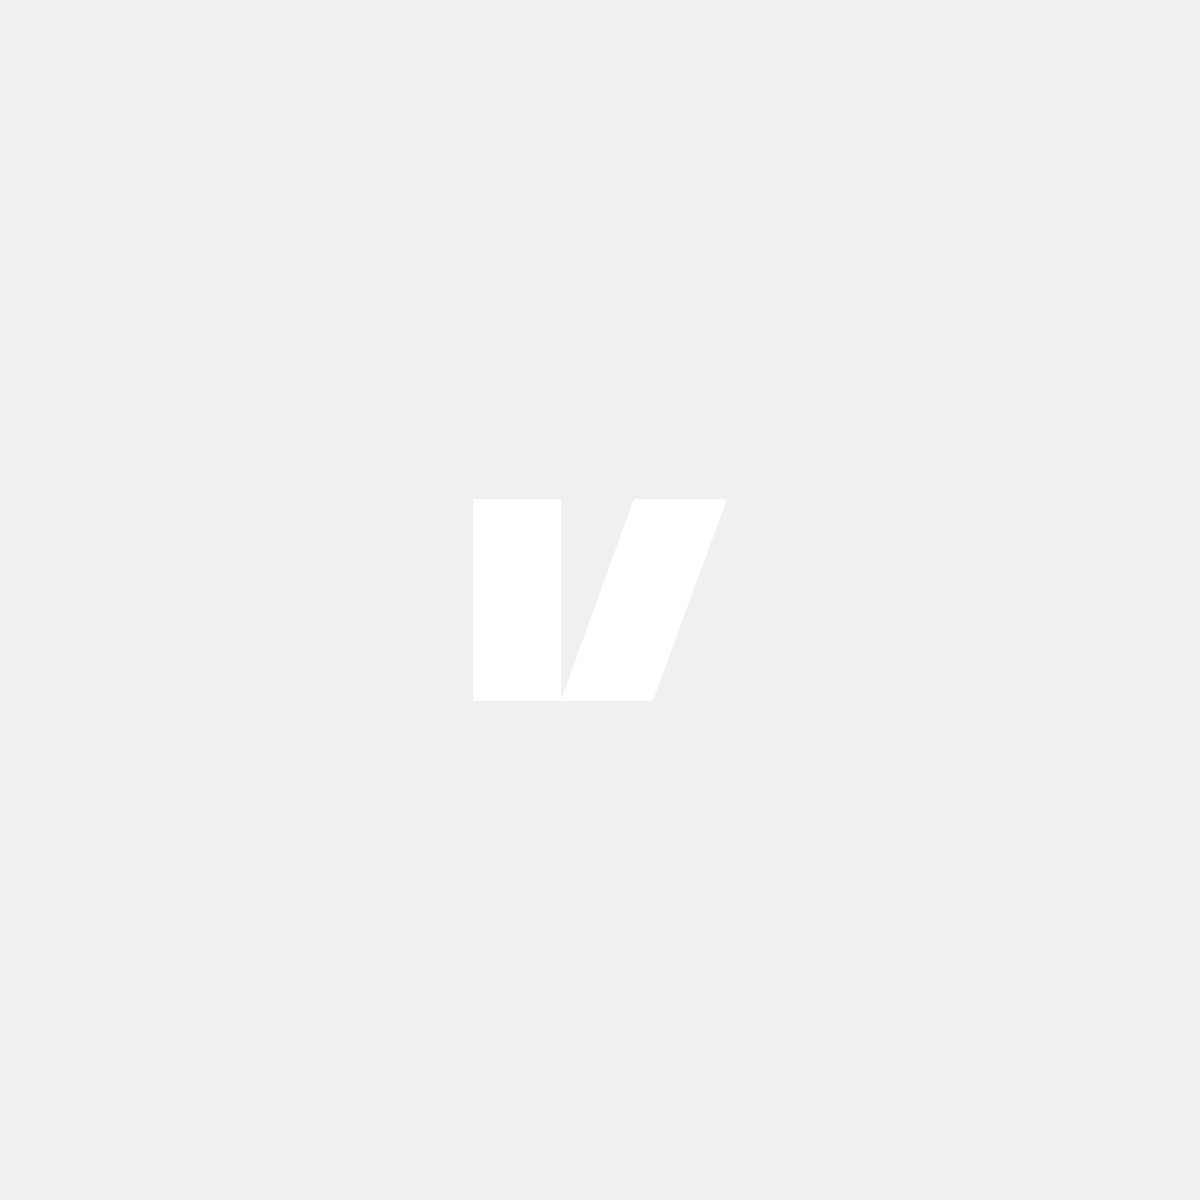 Bagagerumsmatta textil till Volvo XC60 09-17, grå